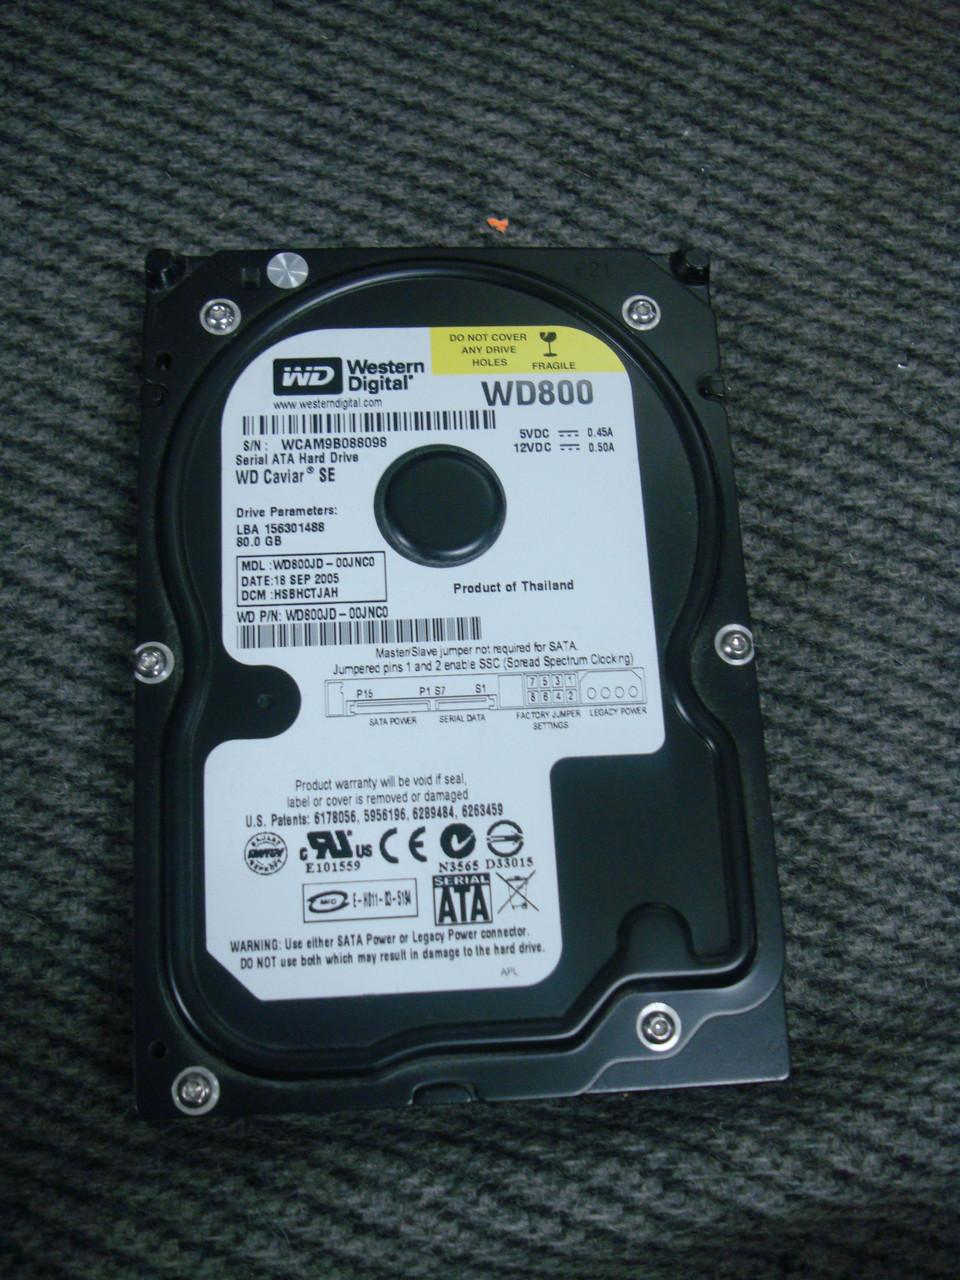 Жесткий диск для ПК WD800 80GB SATA II 7200 об/мин